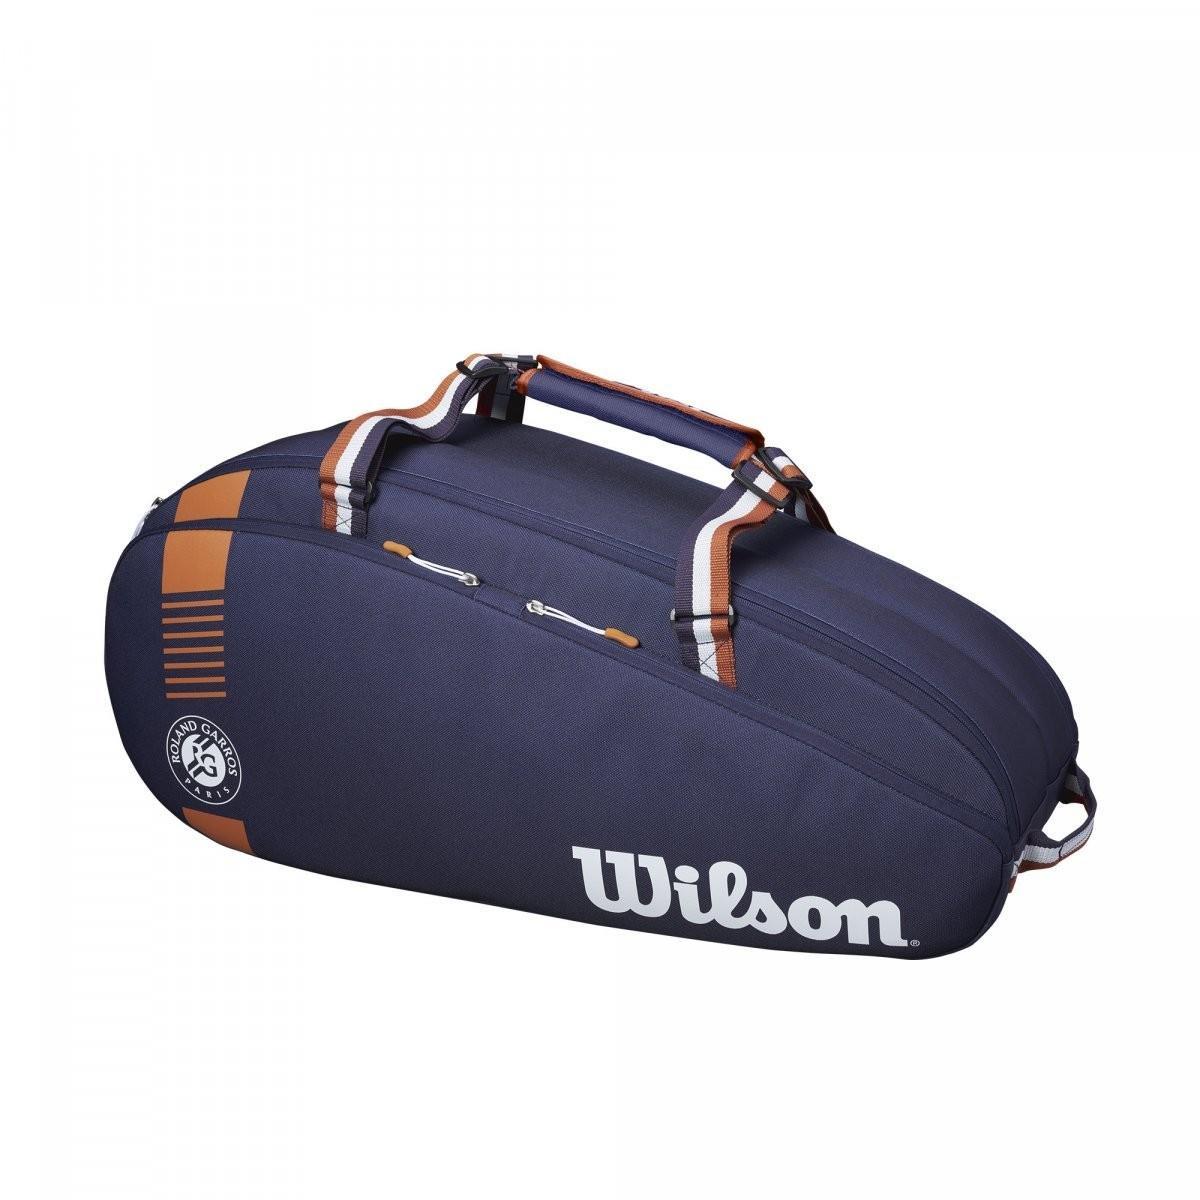 Теннисная сумка Wilson Roland Garros Team 6 Pk Bag navy